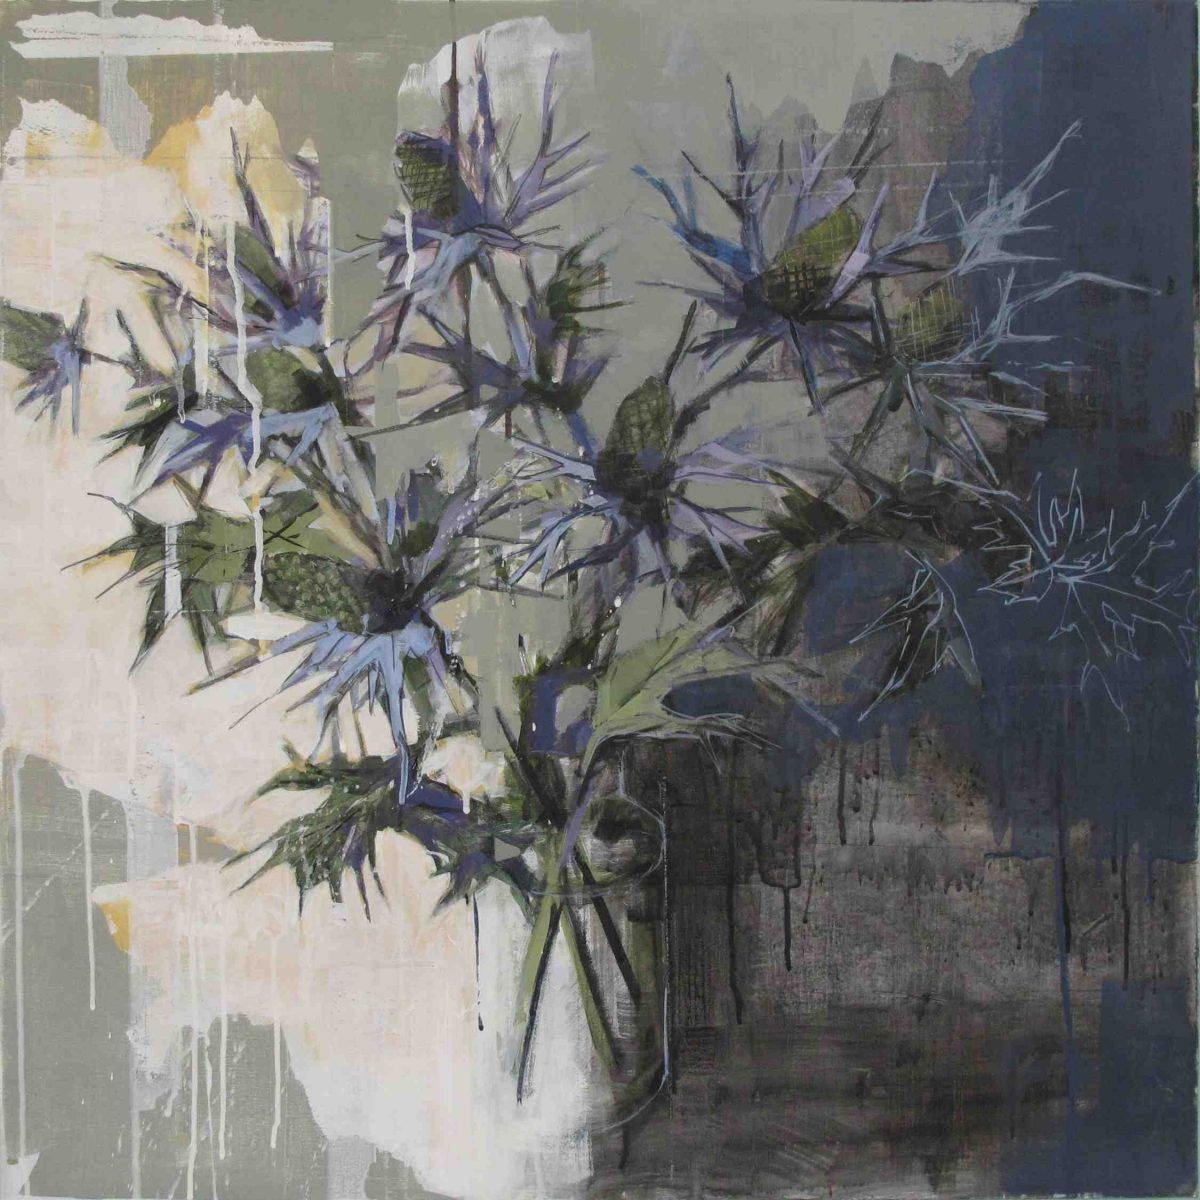 Bridget Flinn: Blue Thistle, acrylic on canvas, 70 x 70cm | Winter Group Exhibition 2017 | Friday 24 November 2017  – Saturday 27 January 2018 | Solomon Fine Art